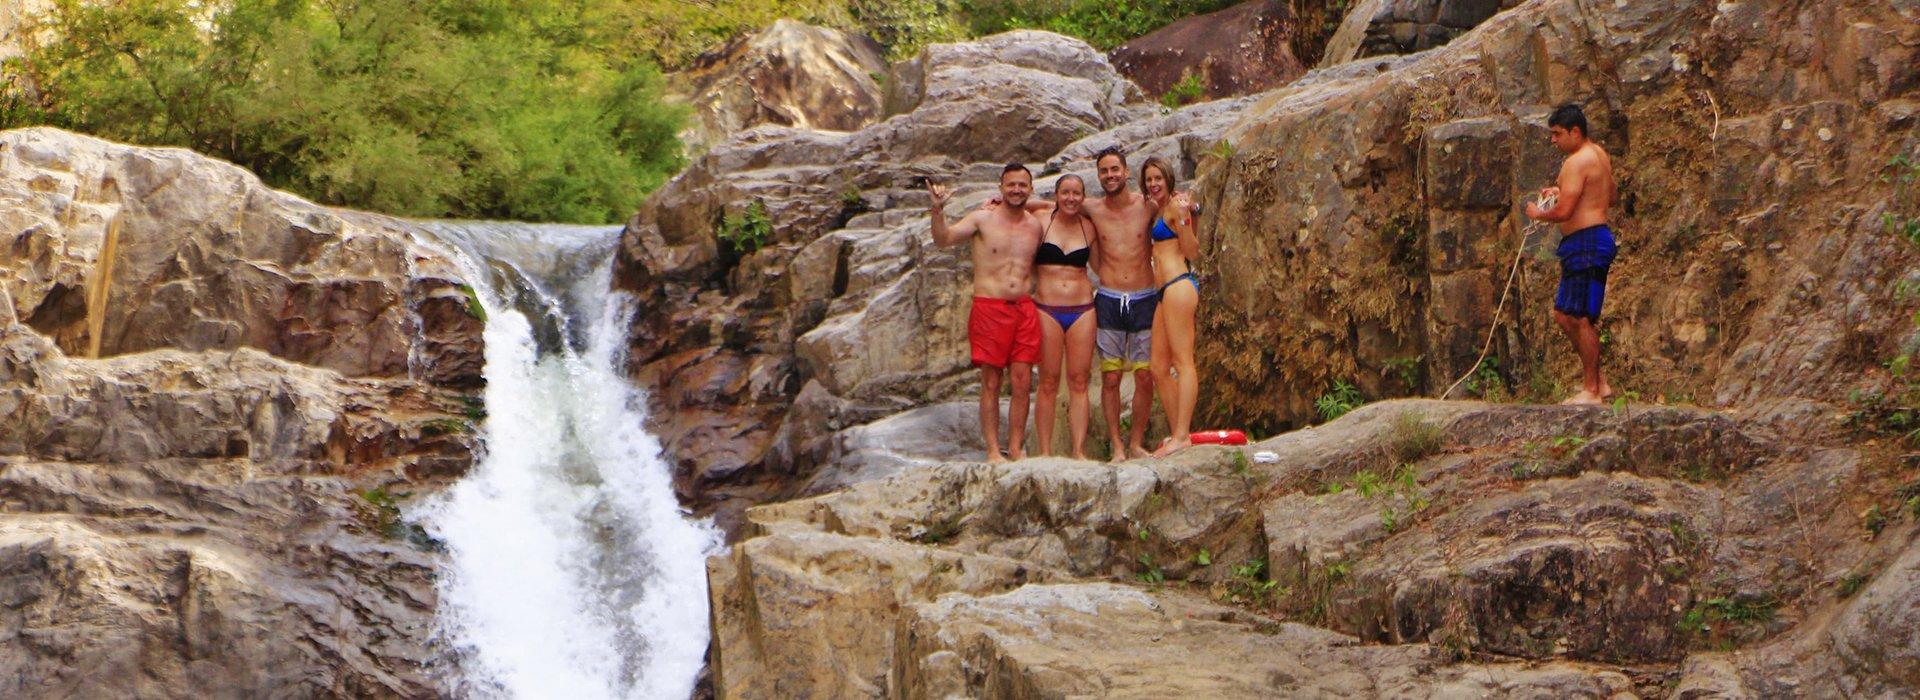 waterfalls pv2 2